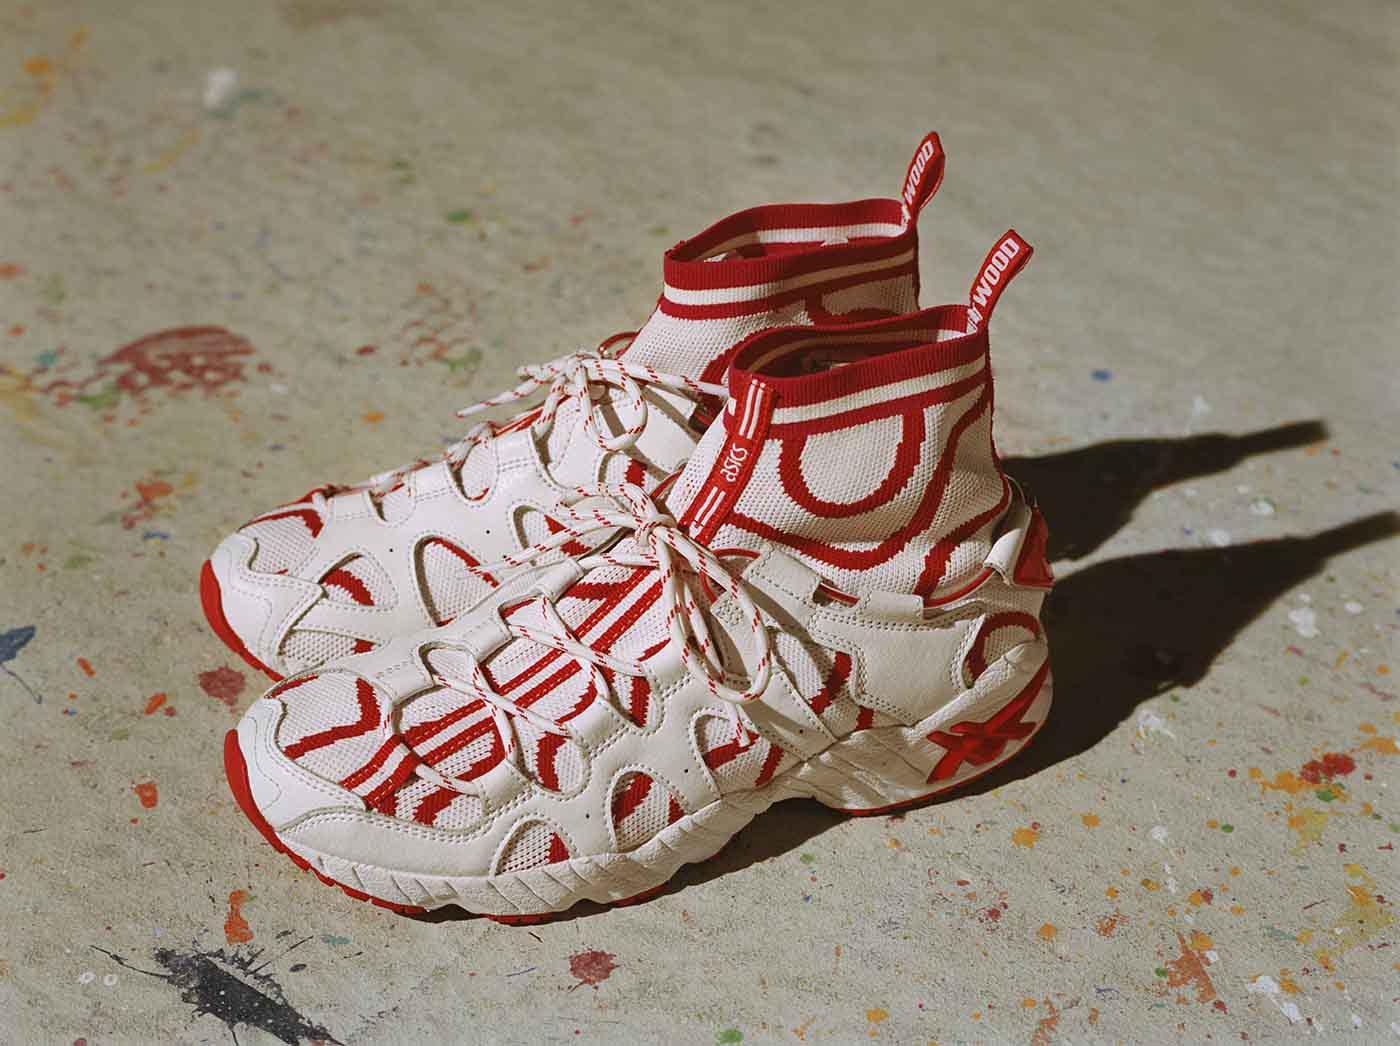 ASICSTIGER x Vivienne Westwood - GEL-MAI Knit